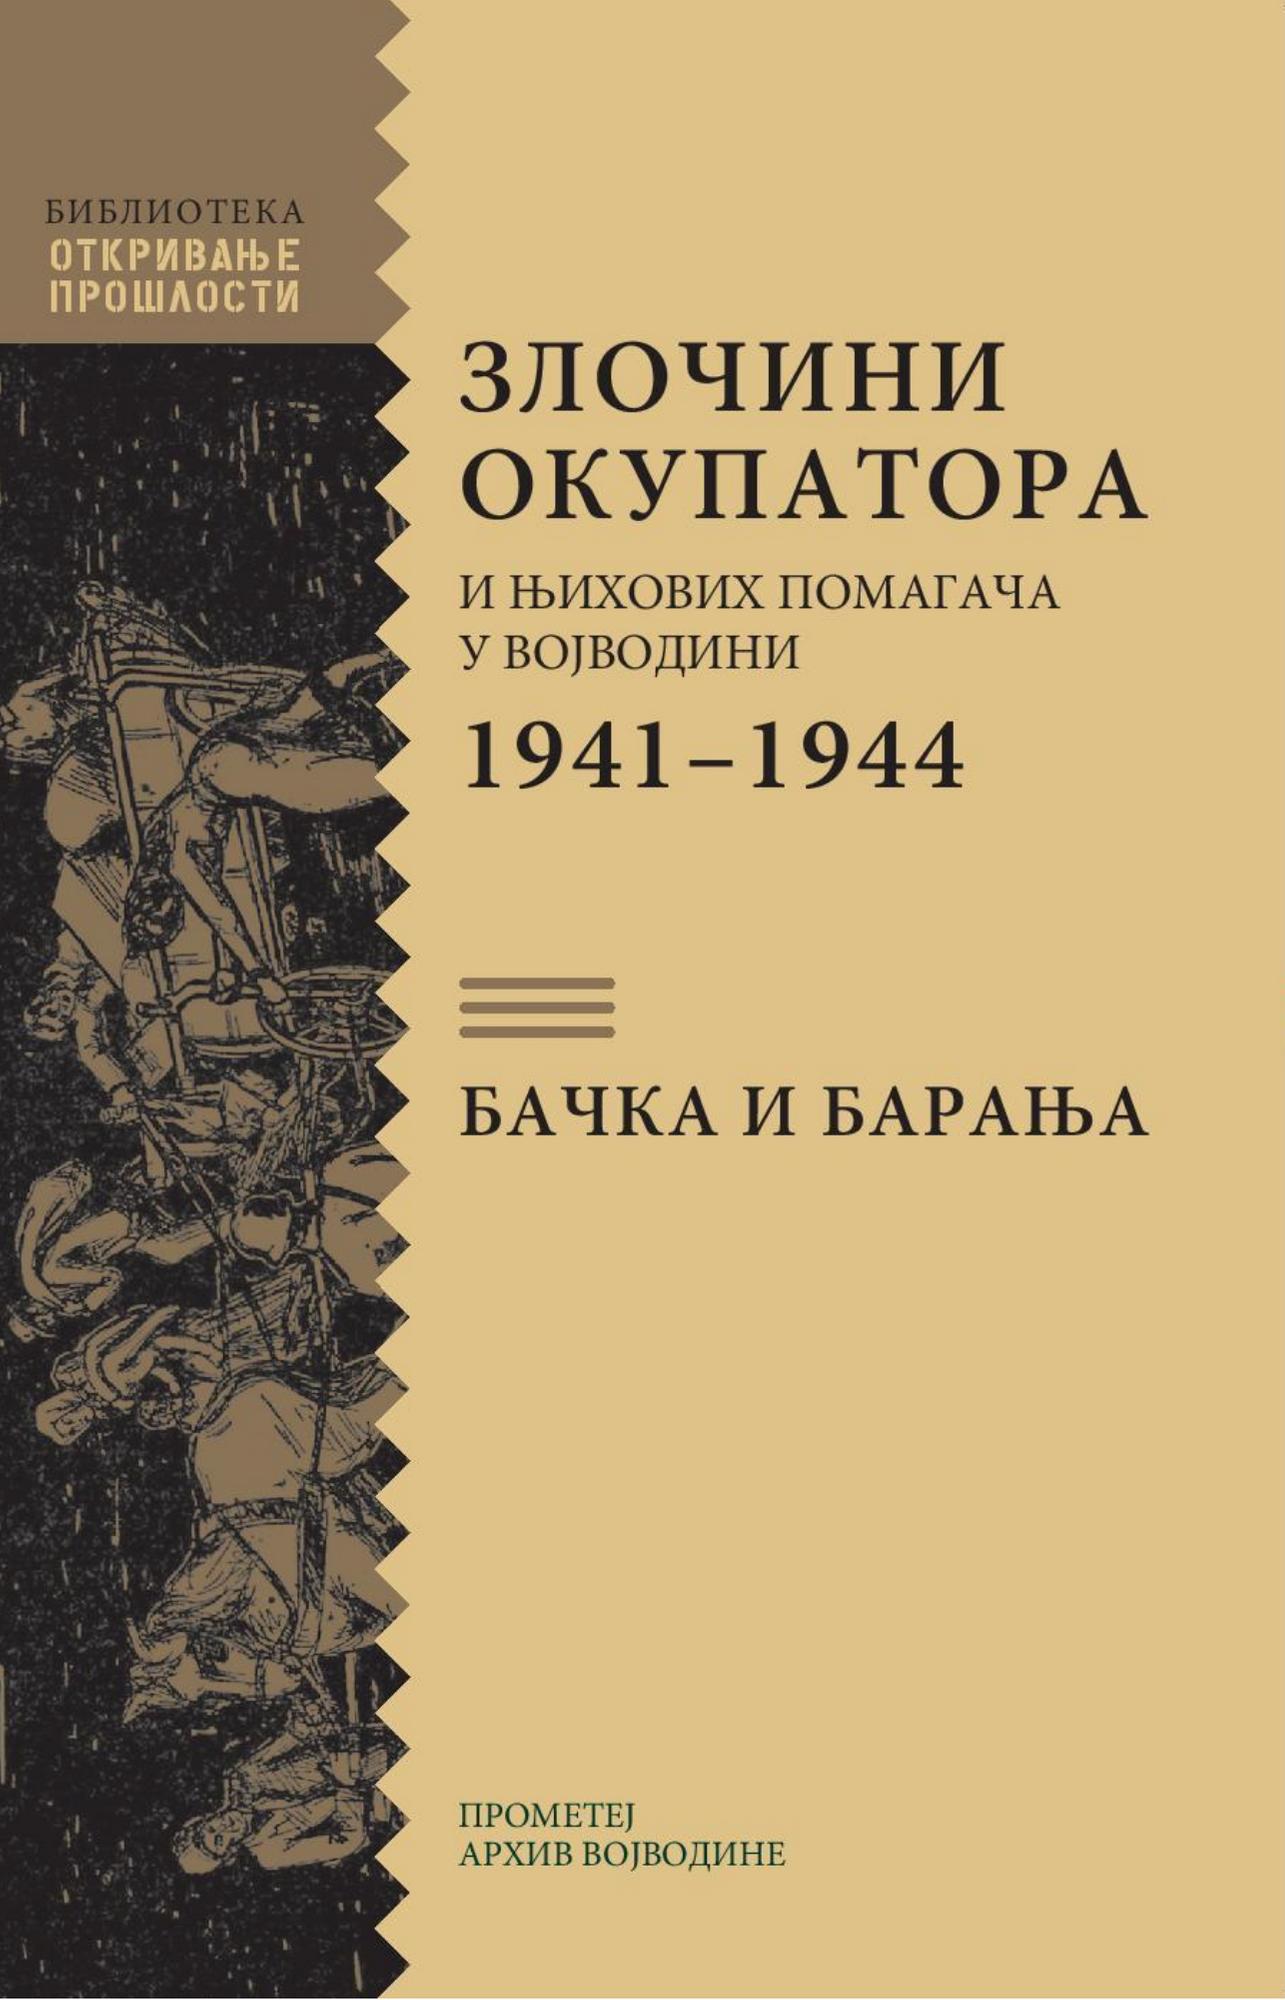 Zločini okupatora i njihovih pomagača u Vojvodini 1941-1944: BAČKA I BARANJA